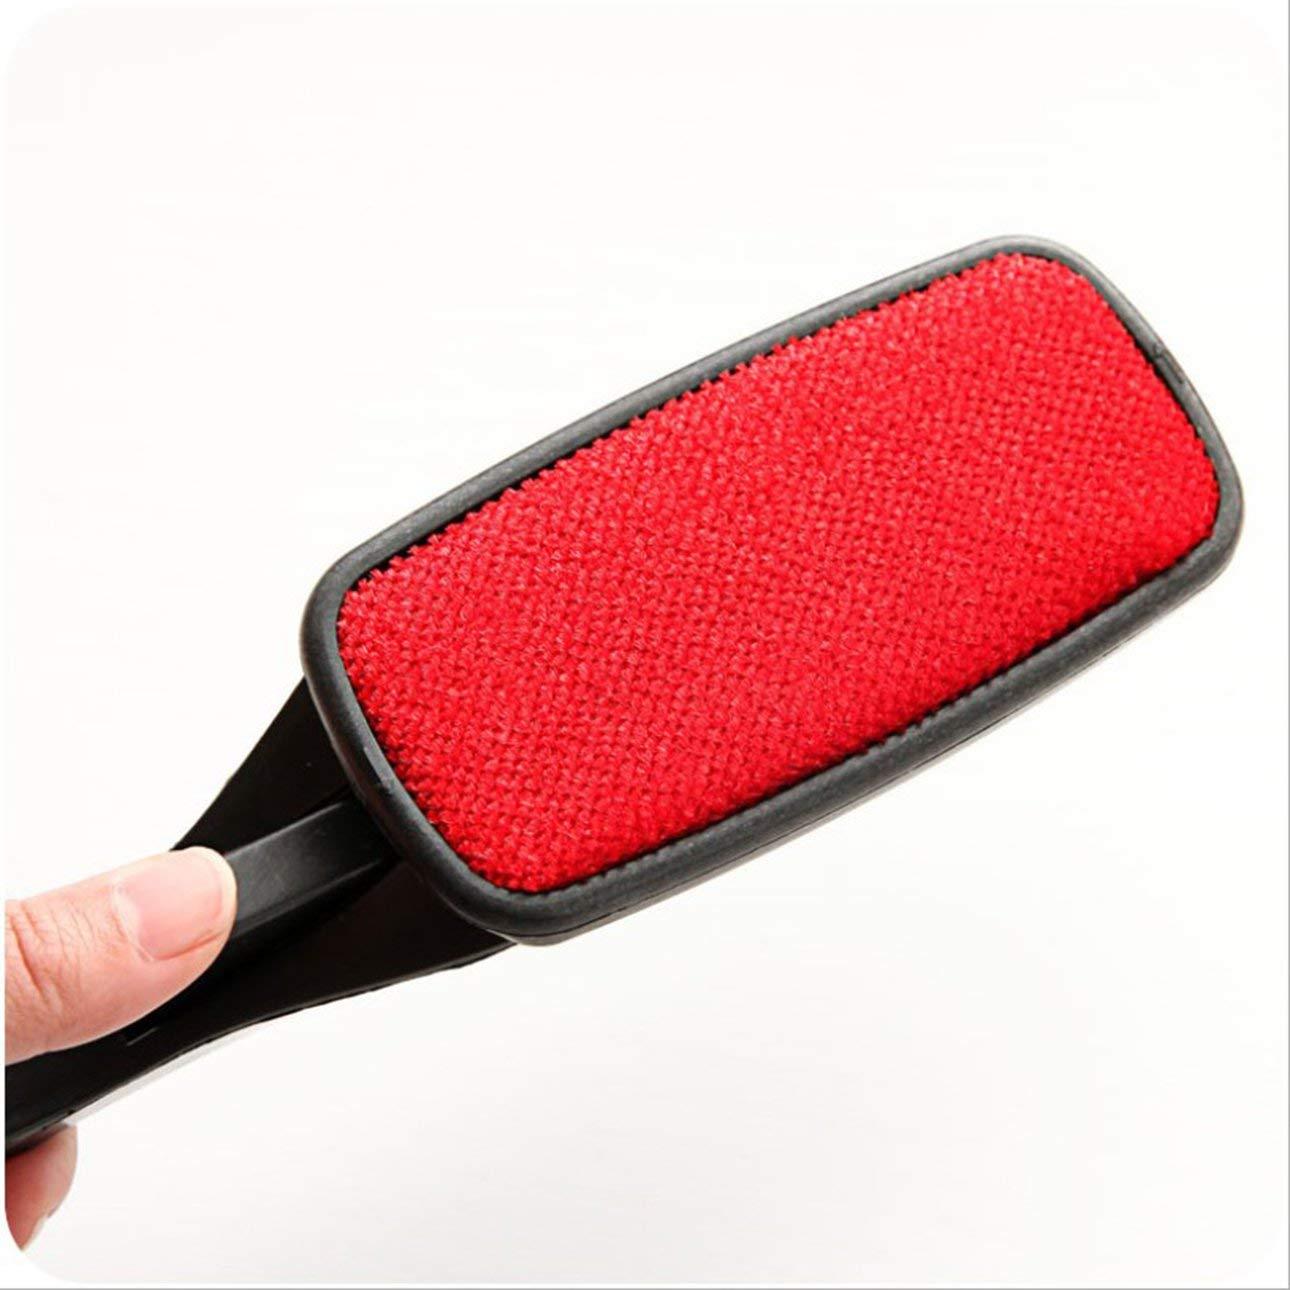 Pudincoco Magic Static Electricity Cloth Fluff Brush Ropa Limpieza electrost/ática Dust Brush Cepillo para el cabello Exfoliante para el cabello